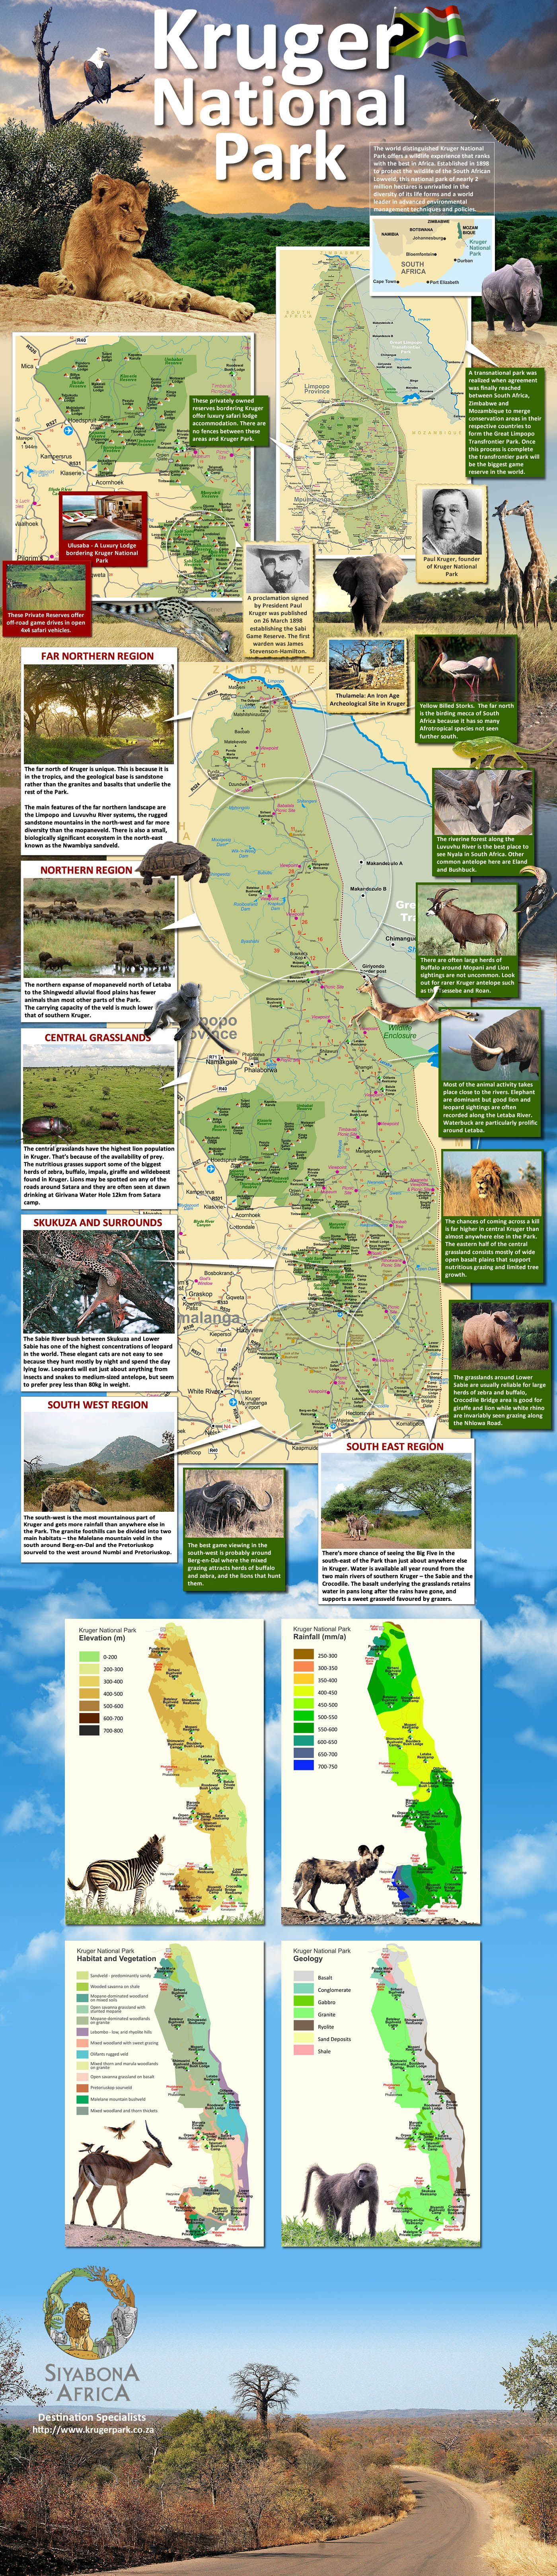 Kruger National Park South Africa You can